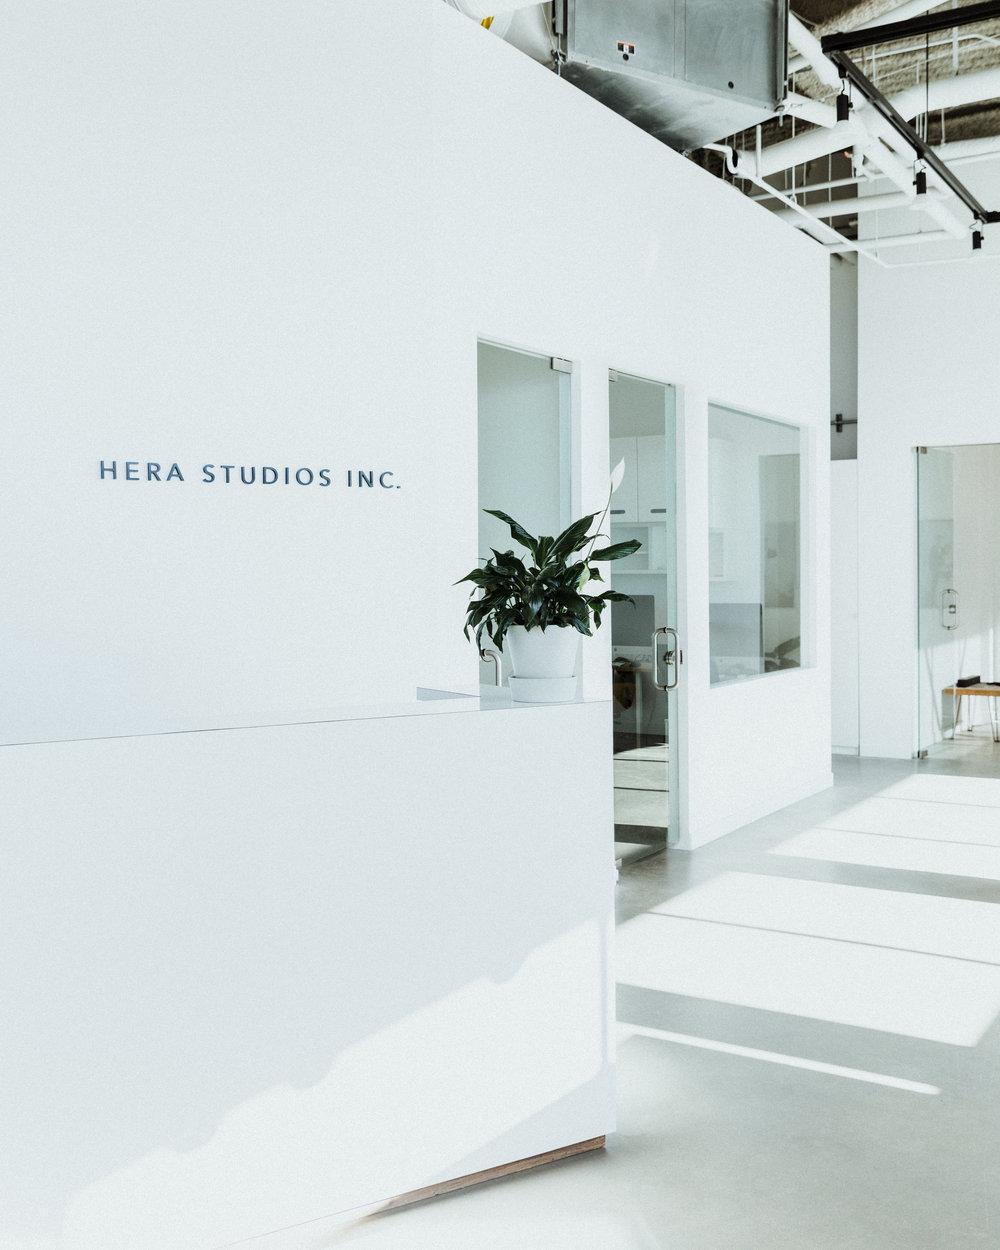 HeraStudios_Selects_Full_2019_StudioPhotos-3.jpg